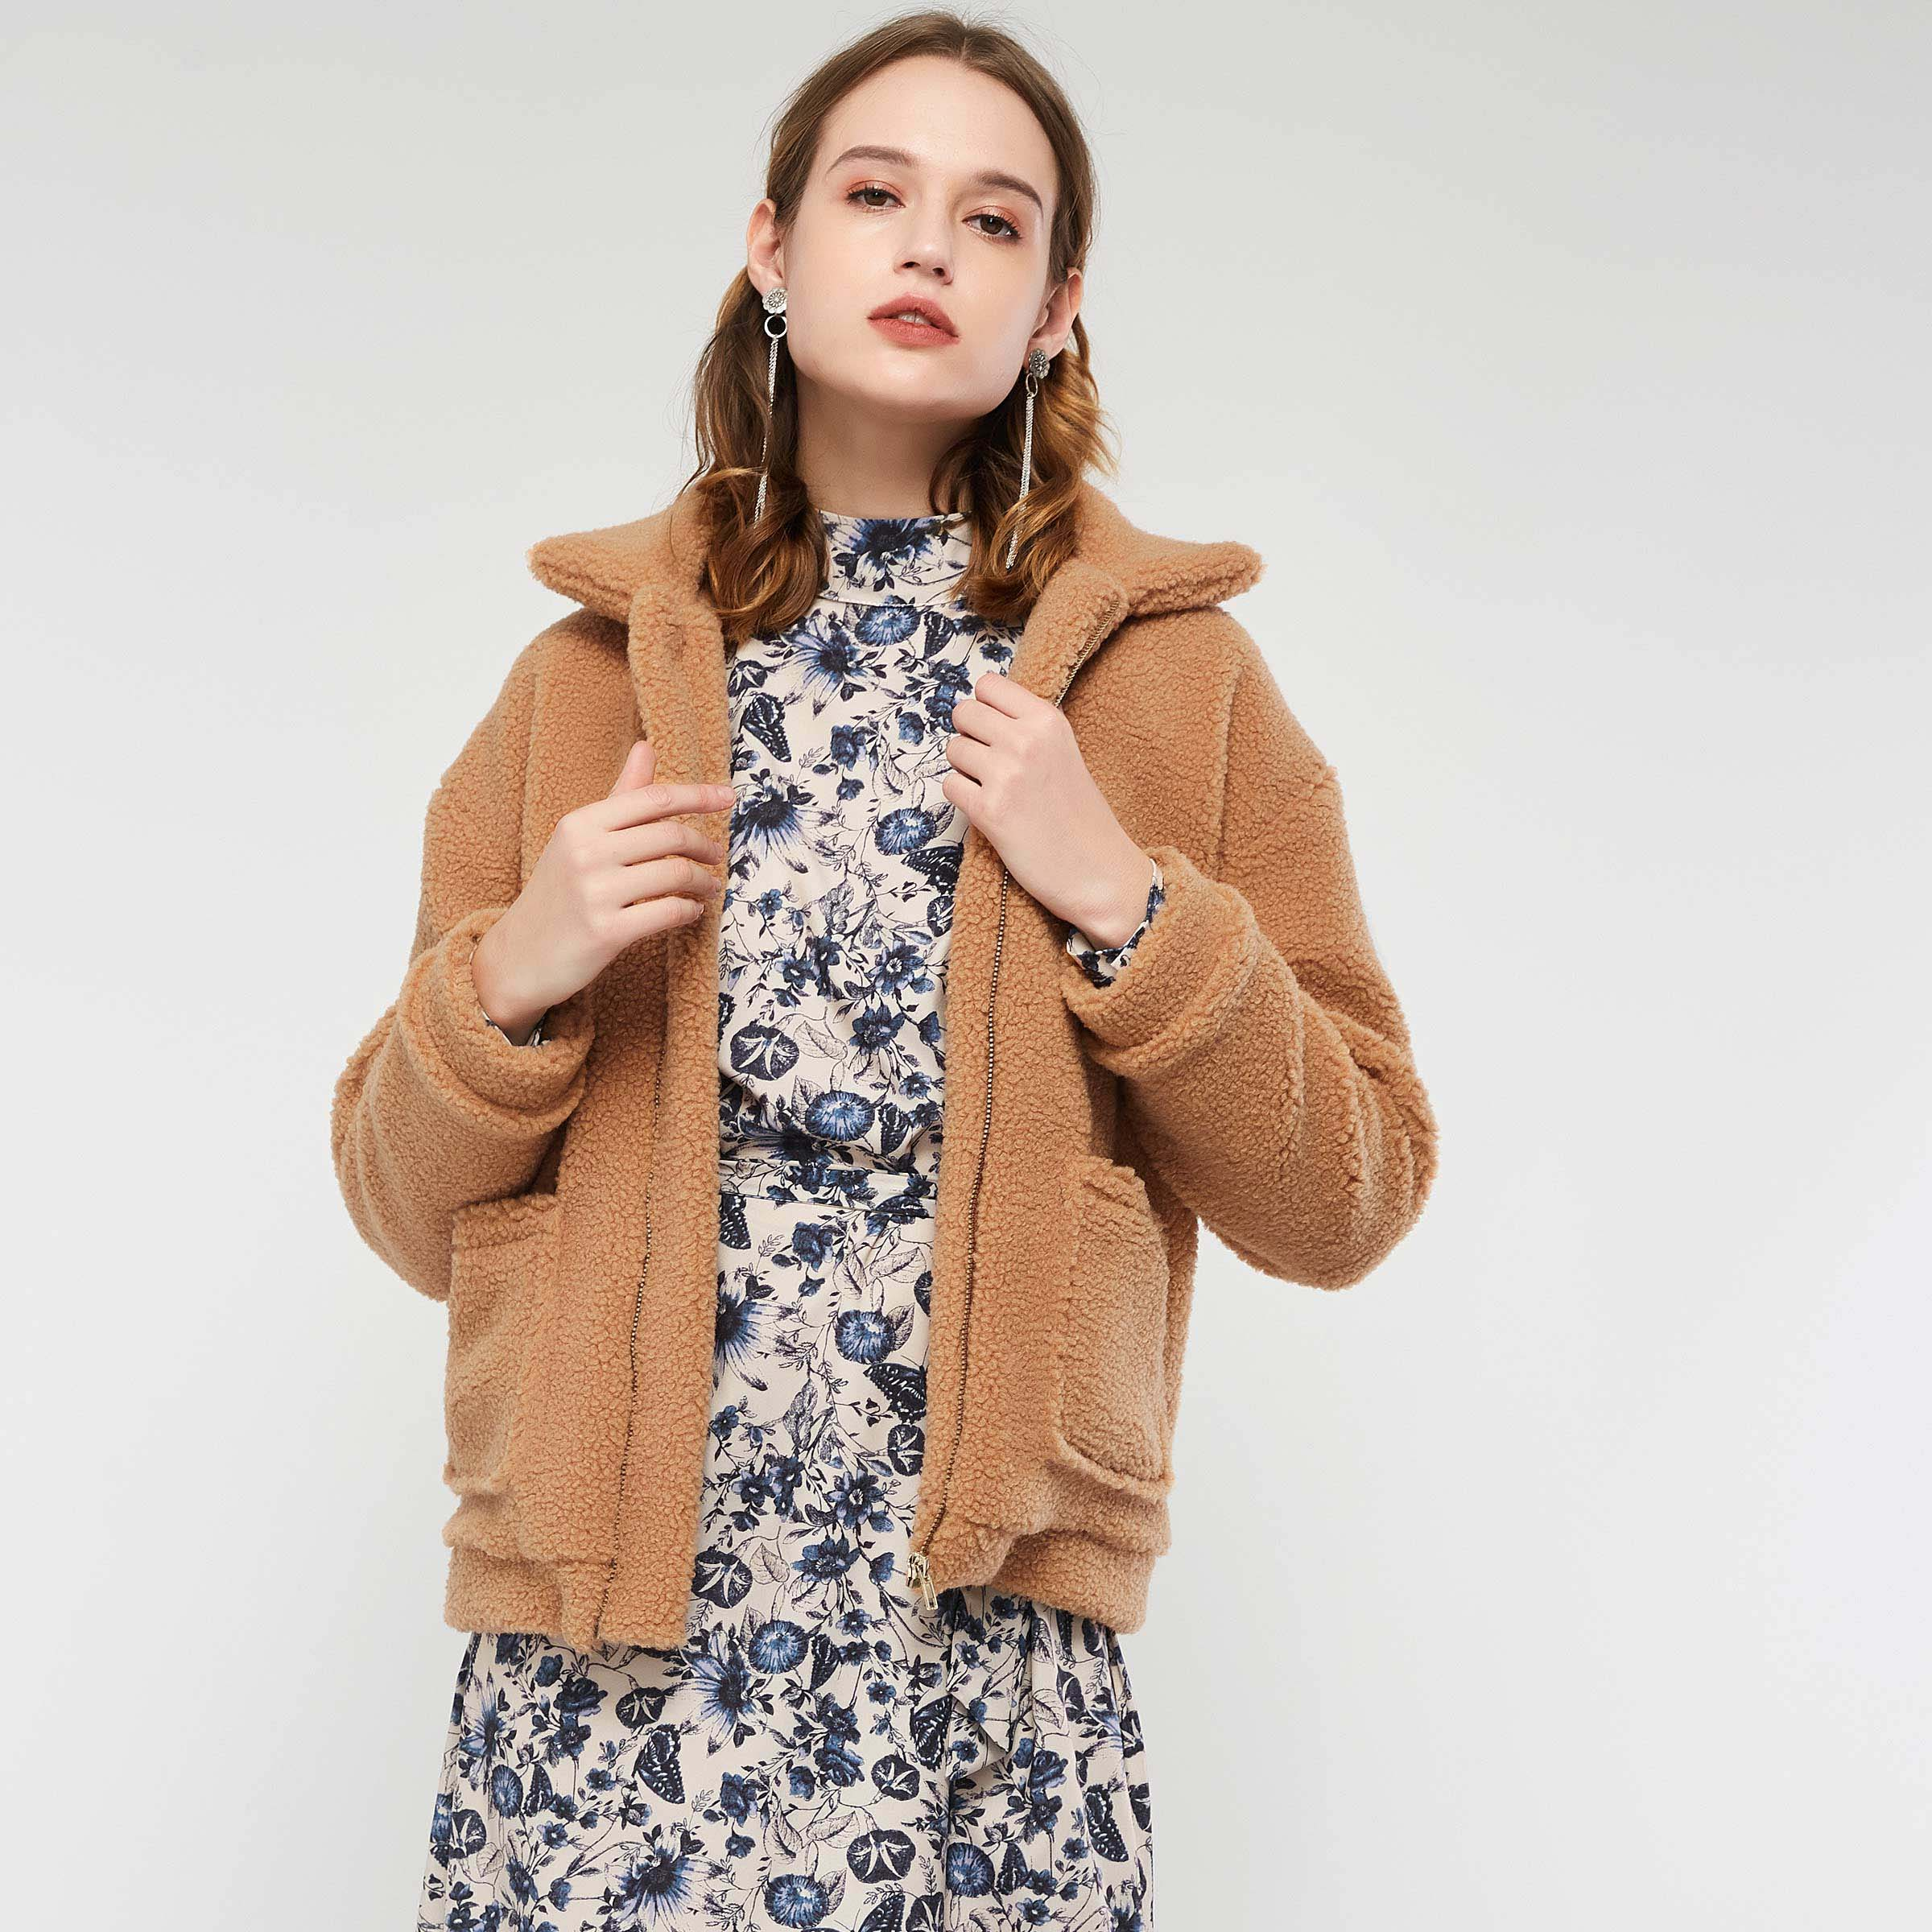 Winter Brown Women Overcoat Thick Warm Pockets Basic Fur Outwear Coat